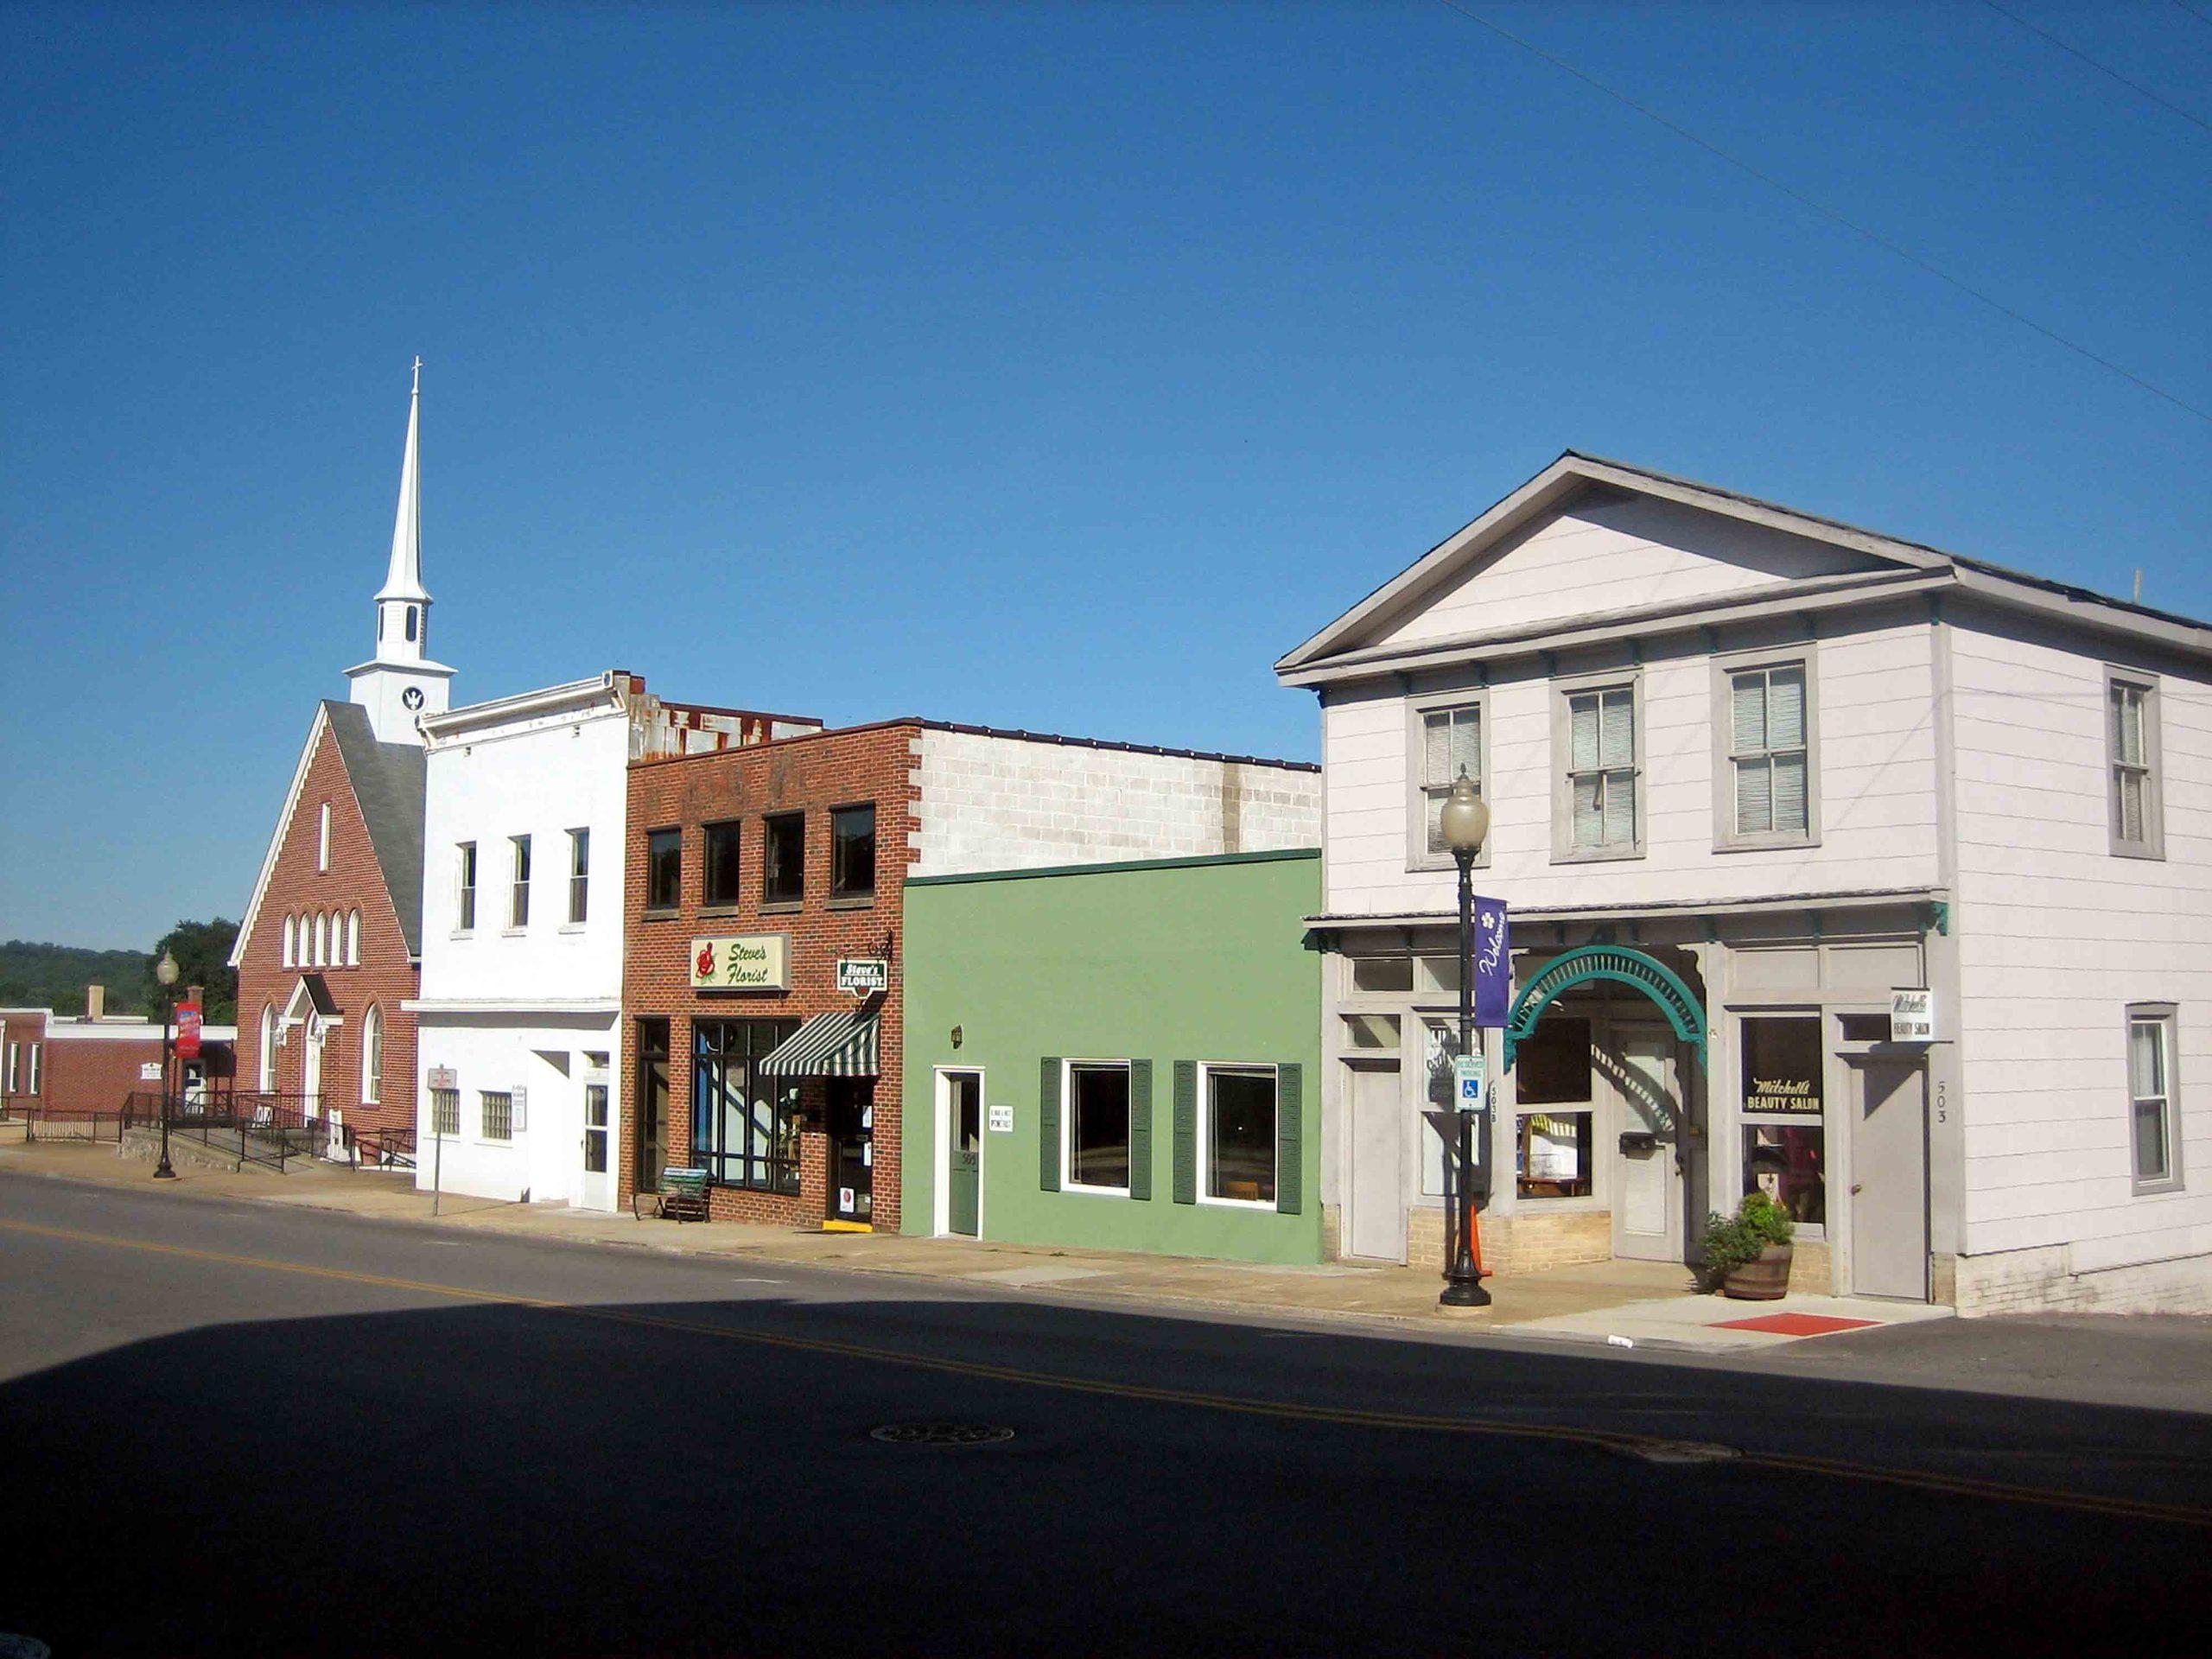 Altavista Downtown Historic District